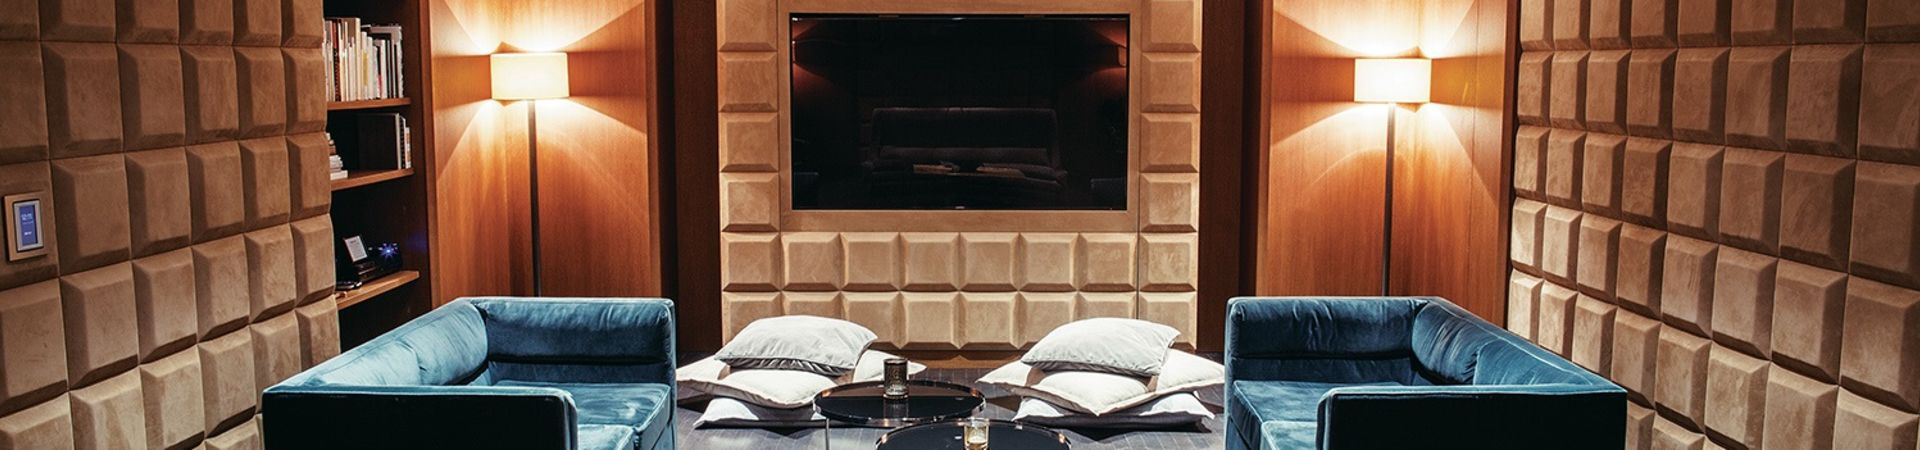 The Emblem Hotel - The M Lounge